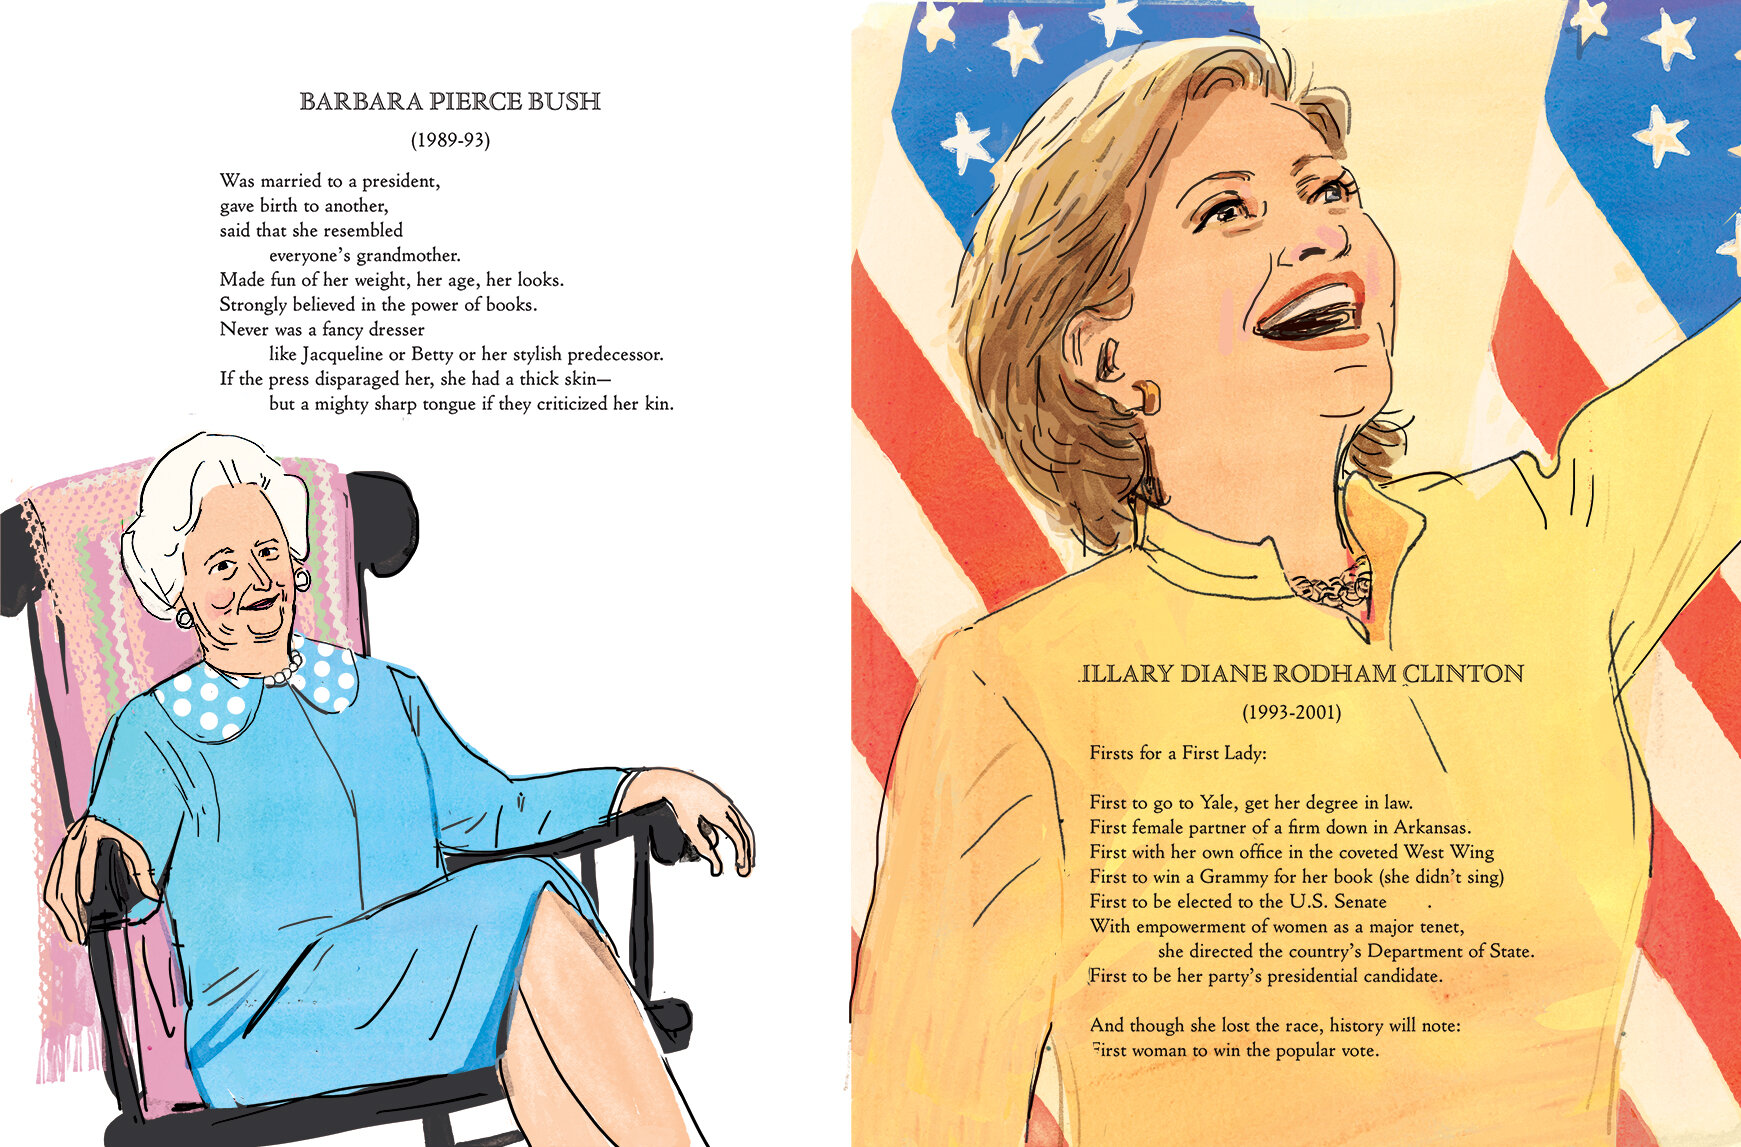 Endpaper illustrations